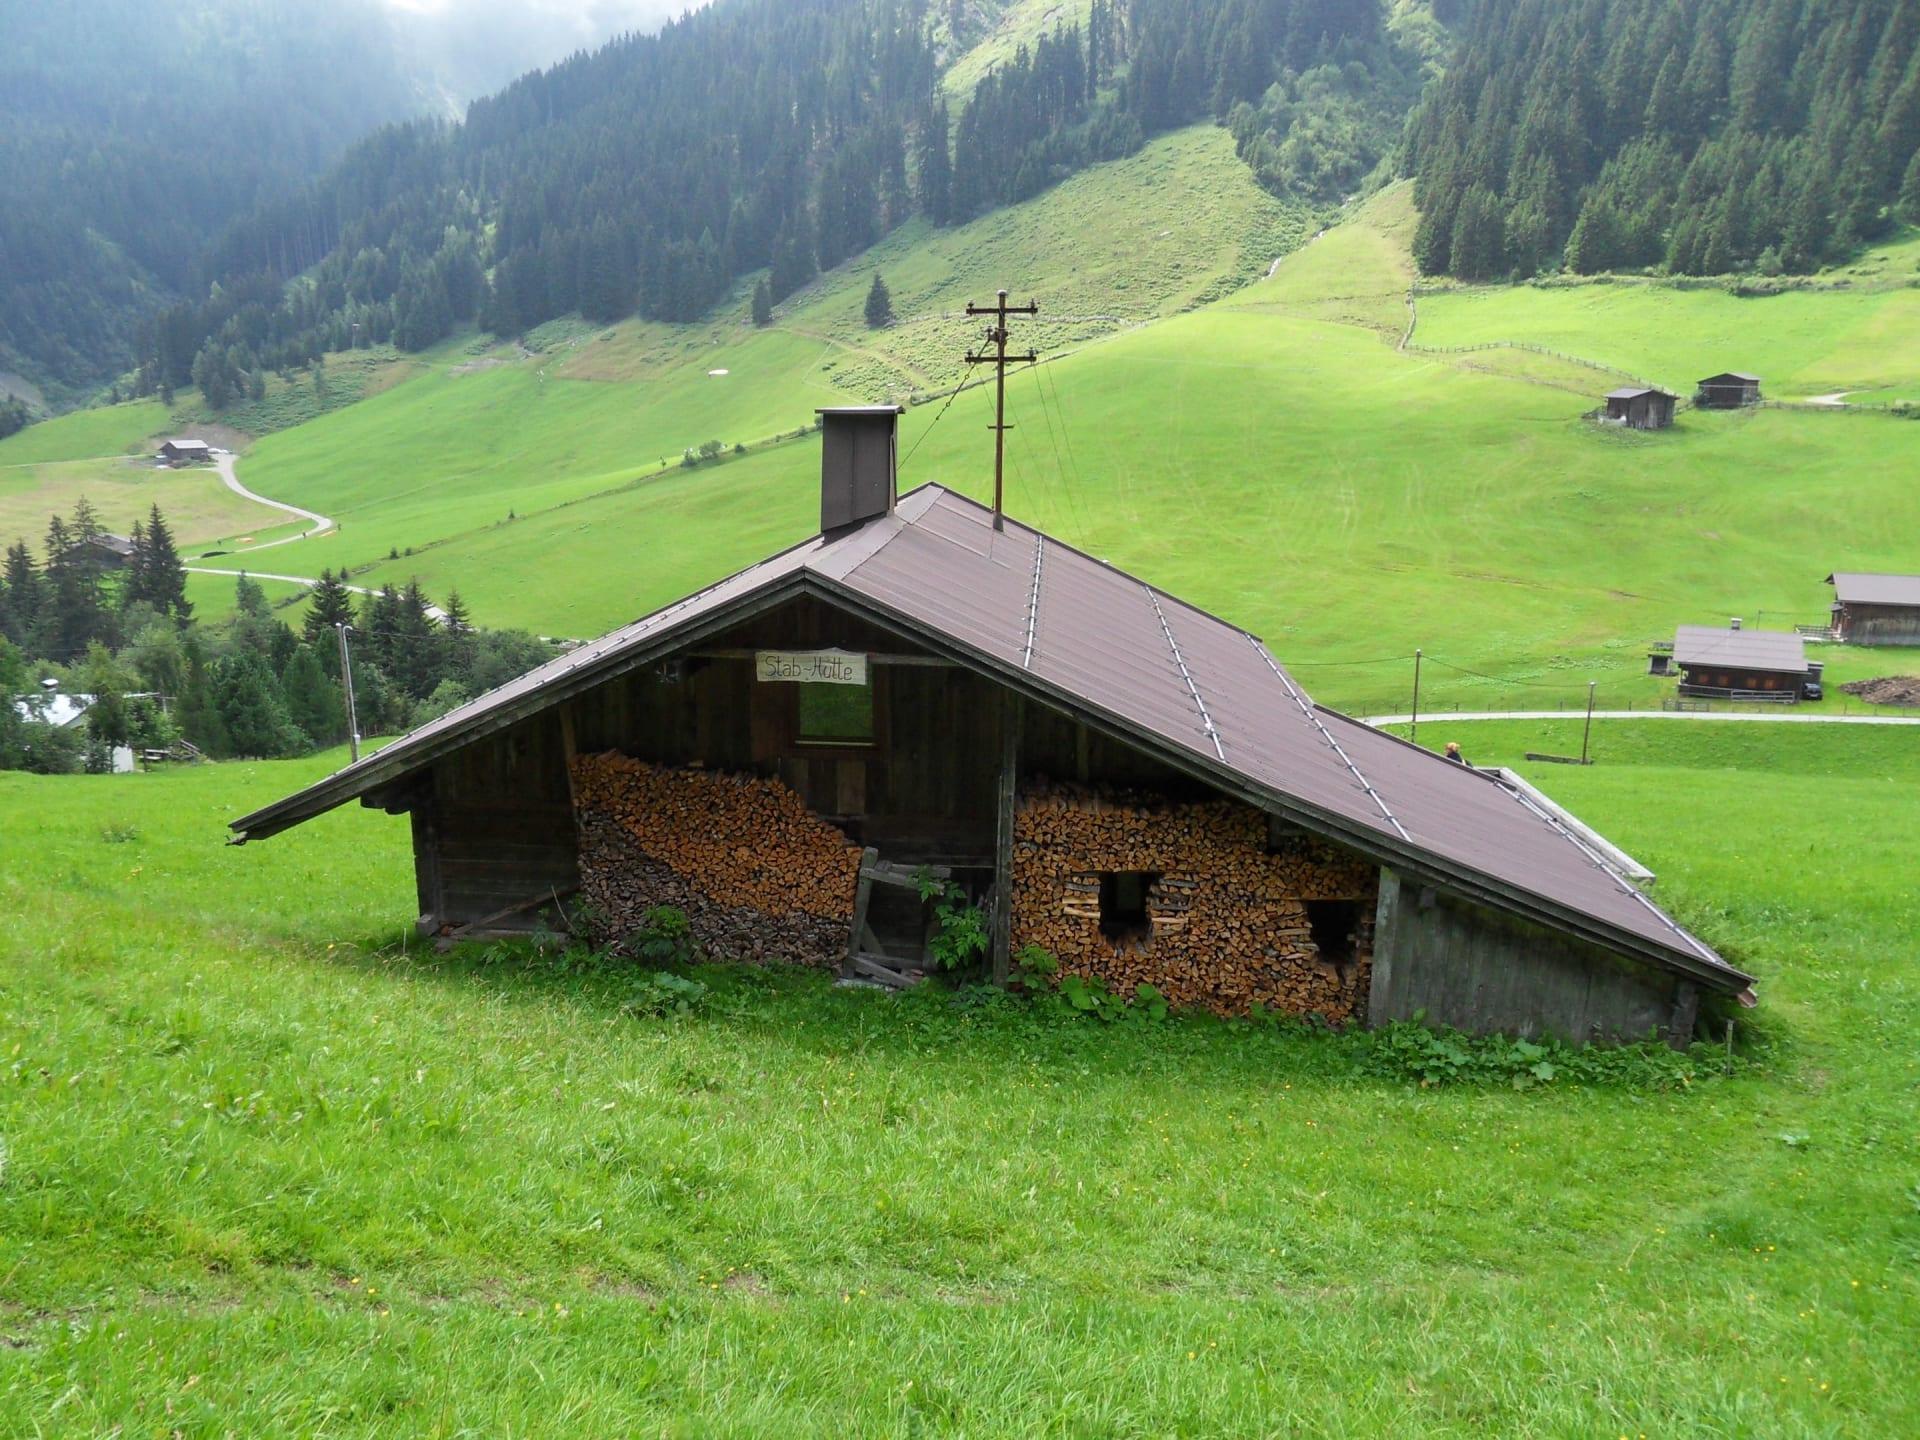 Hütte vom Feldweg aus